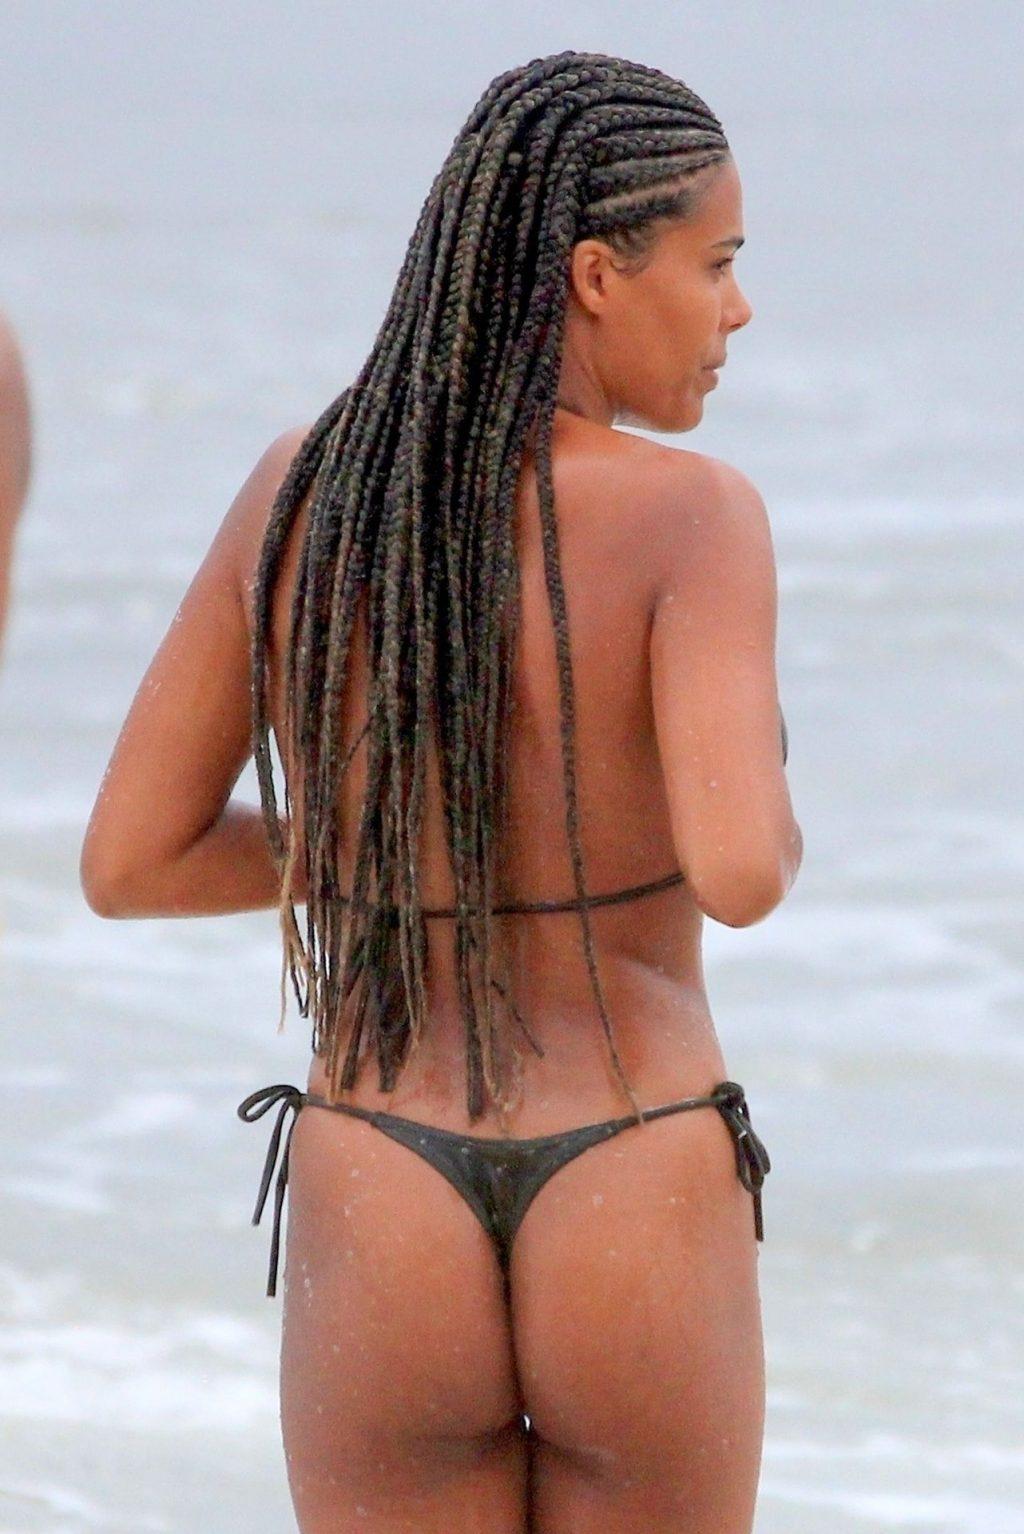 Stunning Tina Kunakey Displays New Braids and Sexy Bikini Body in Rio (46 Photos)